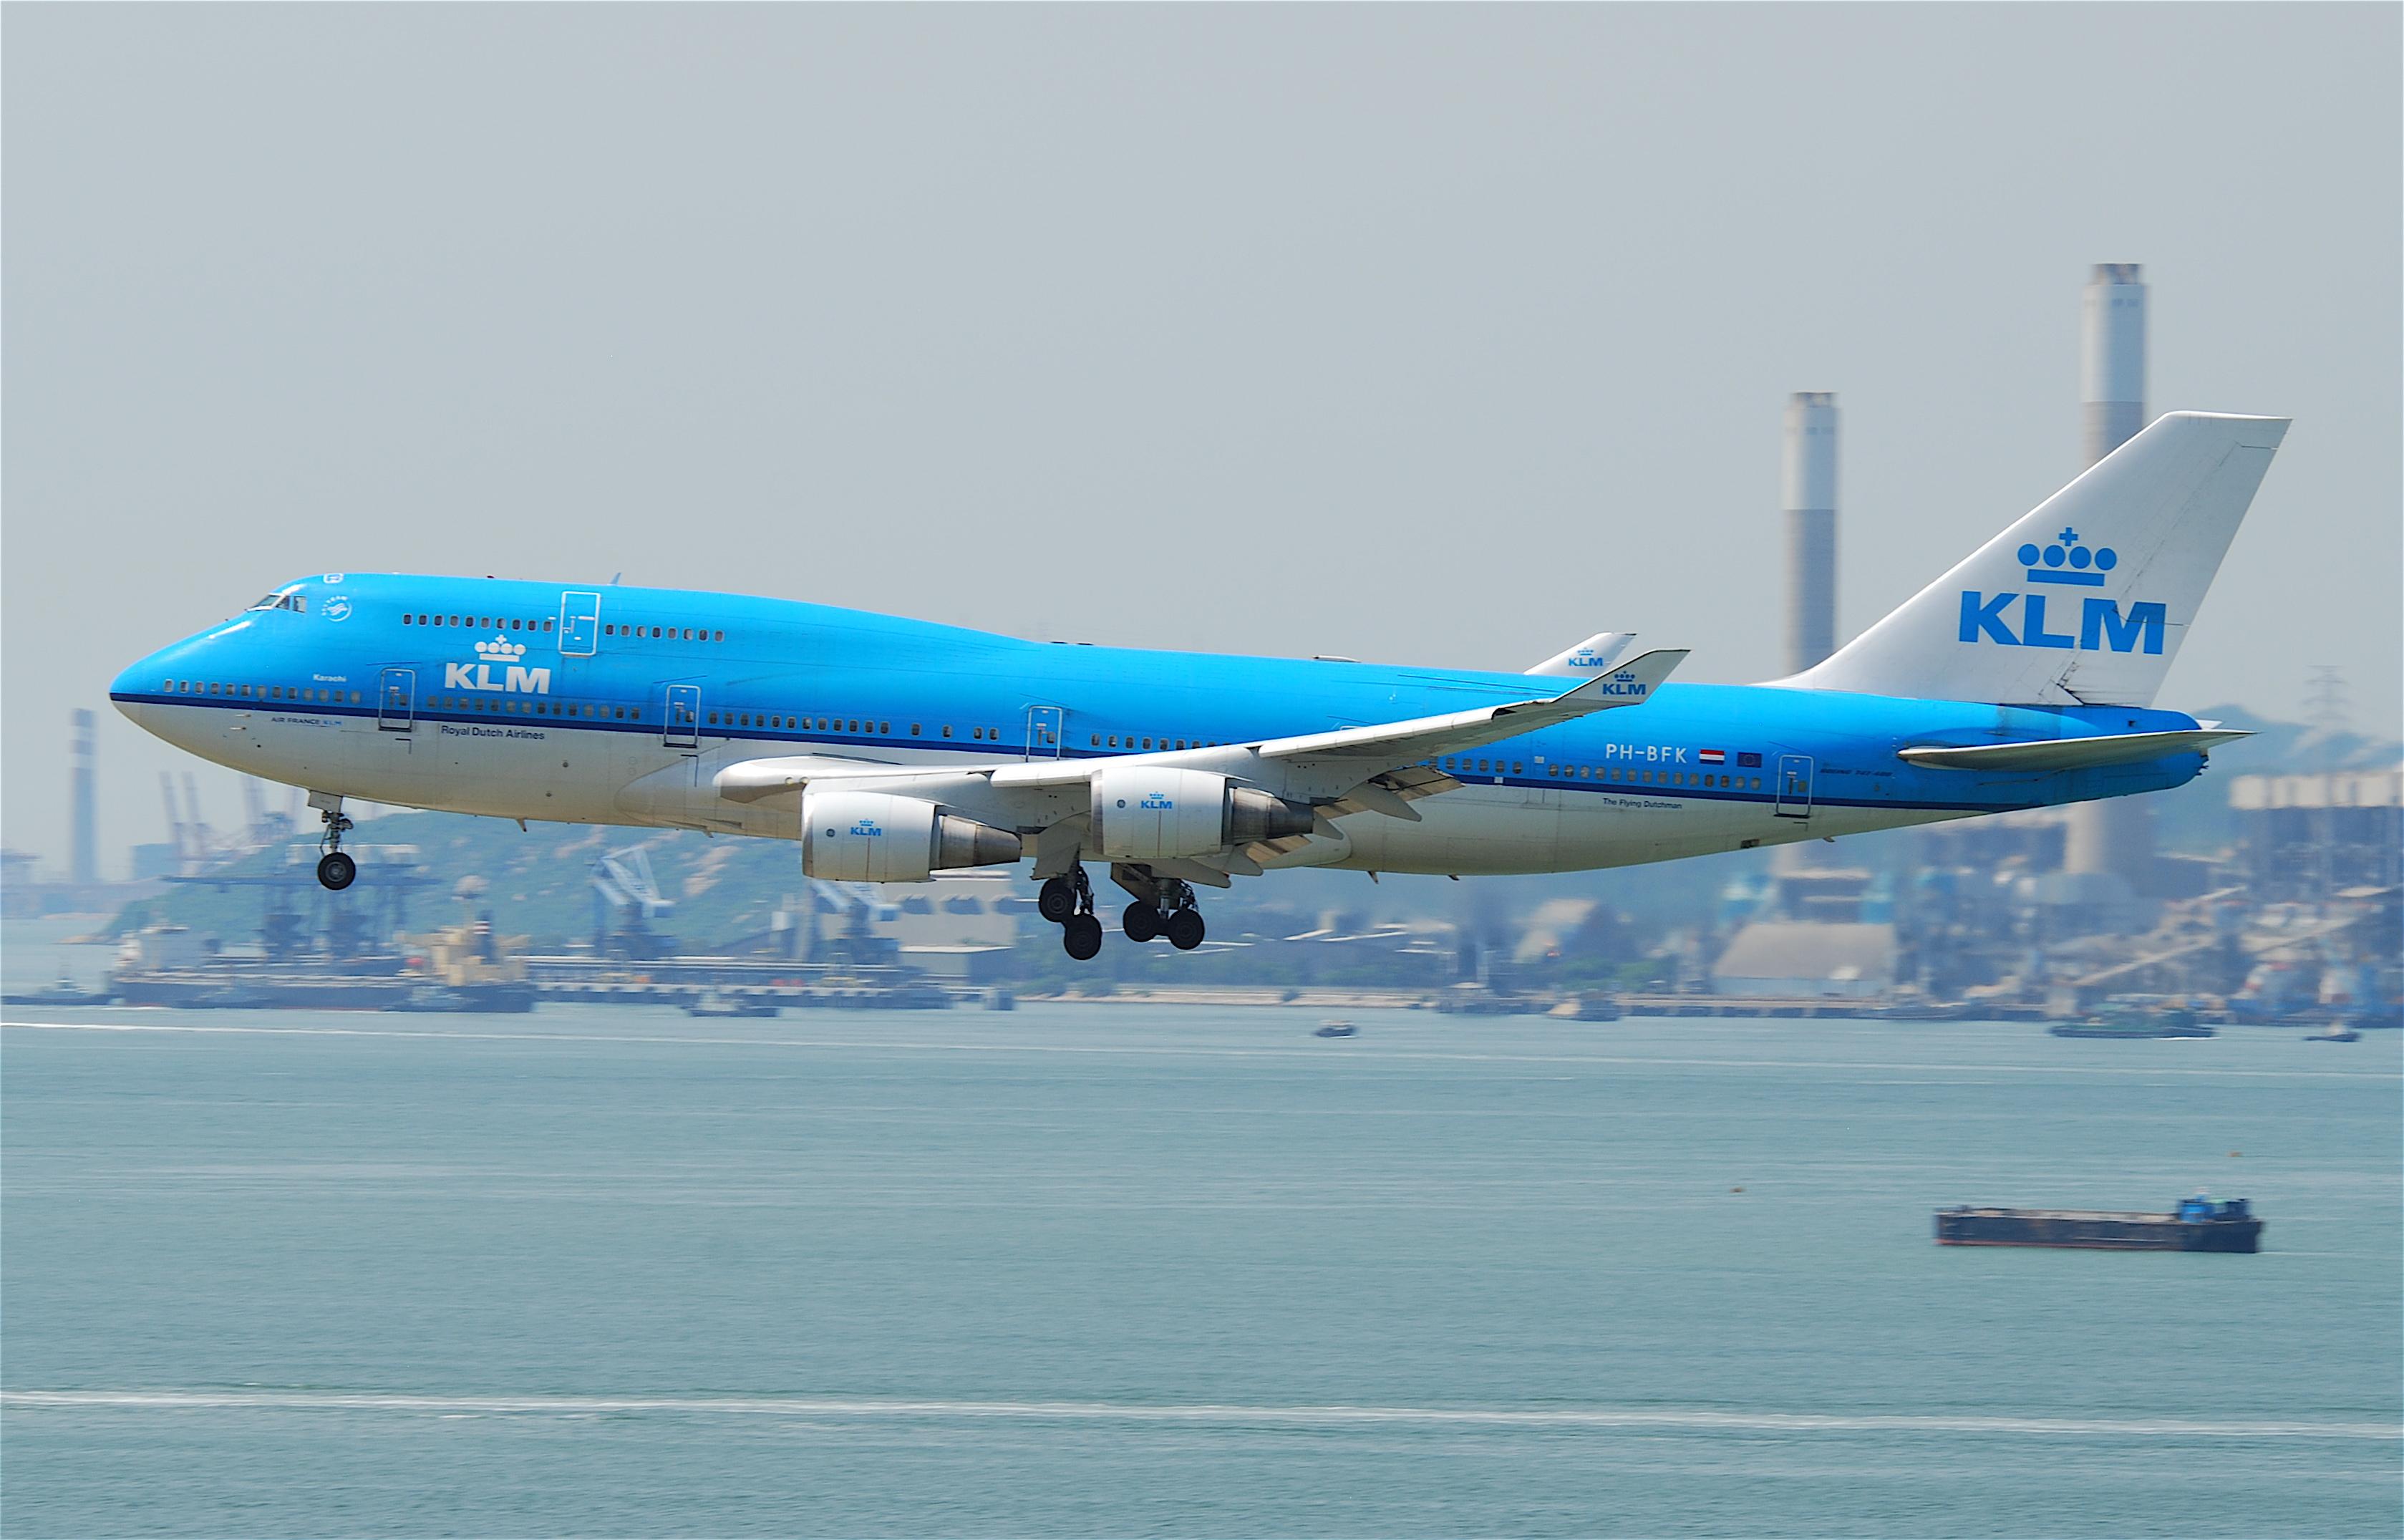 Boeing 747-400 fra KLM under landing i Hong Kong International Airport (Foto: Aero Icarus | Creative Commons 2.0)